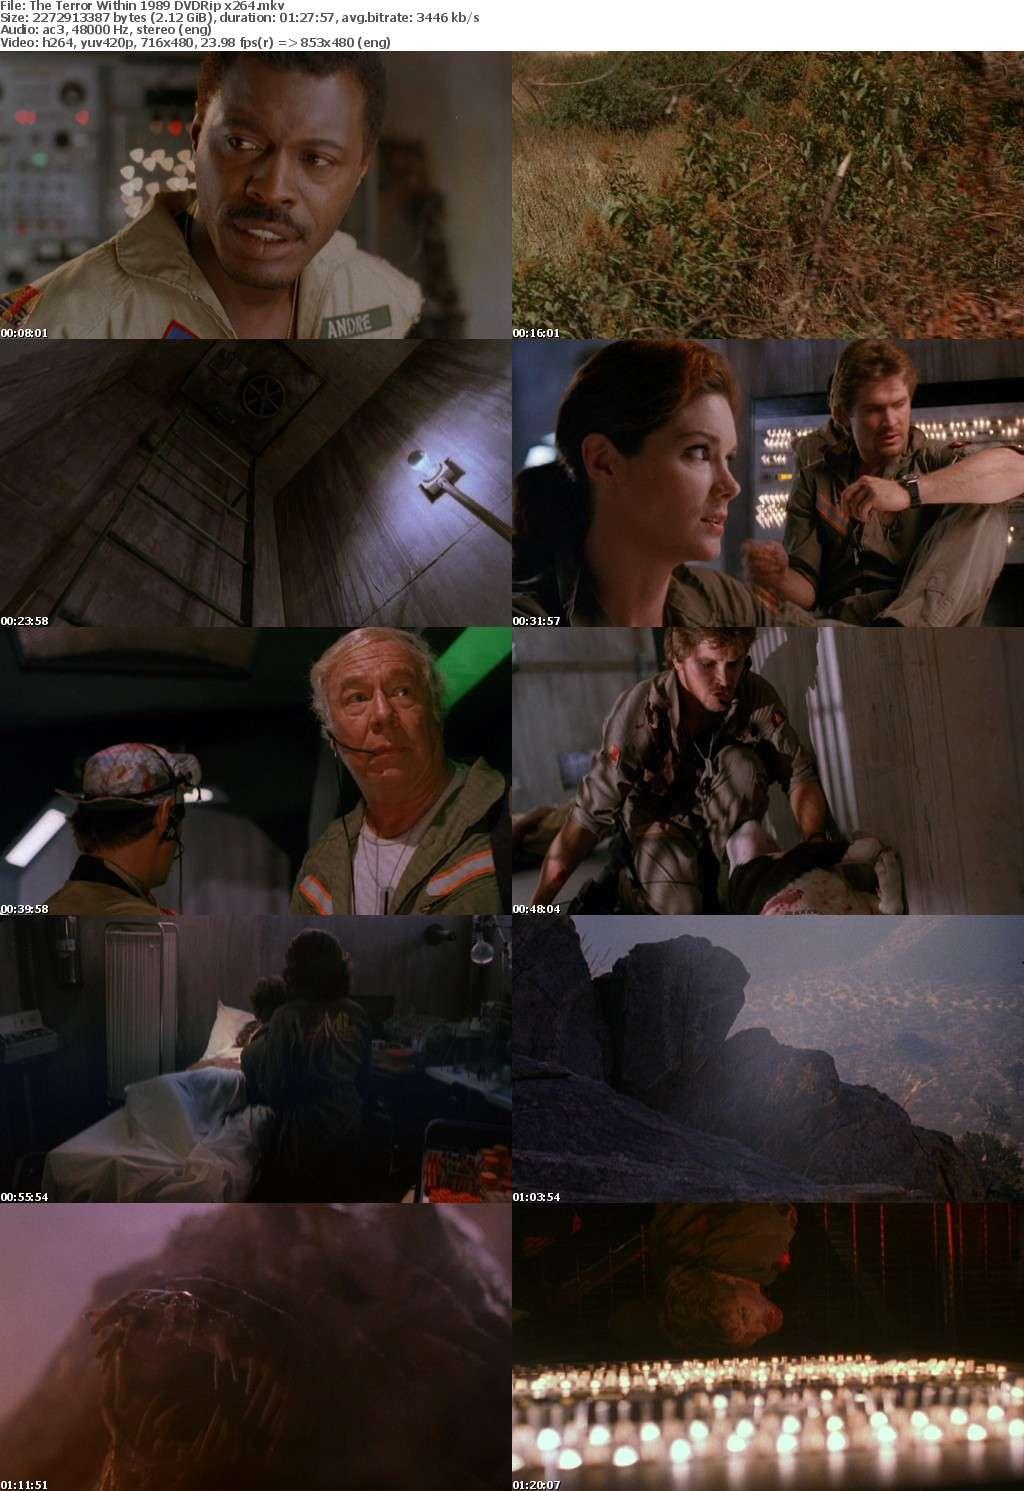 The Terror Within 1989 DVDRip x264